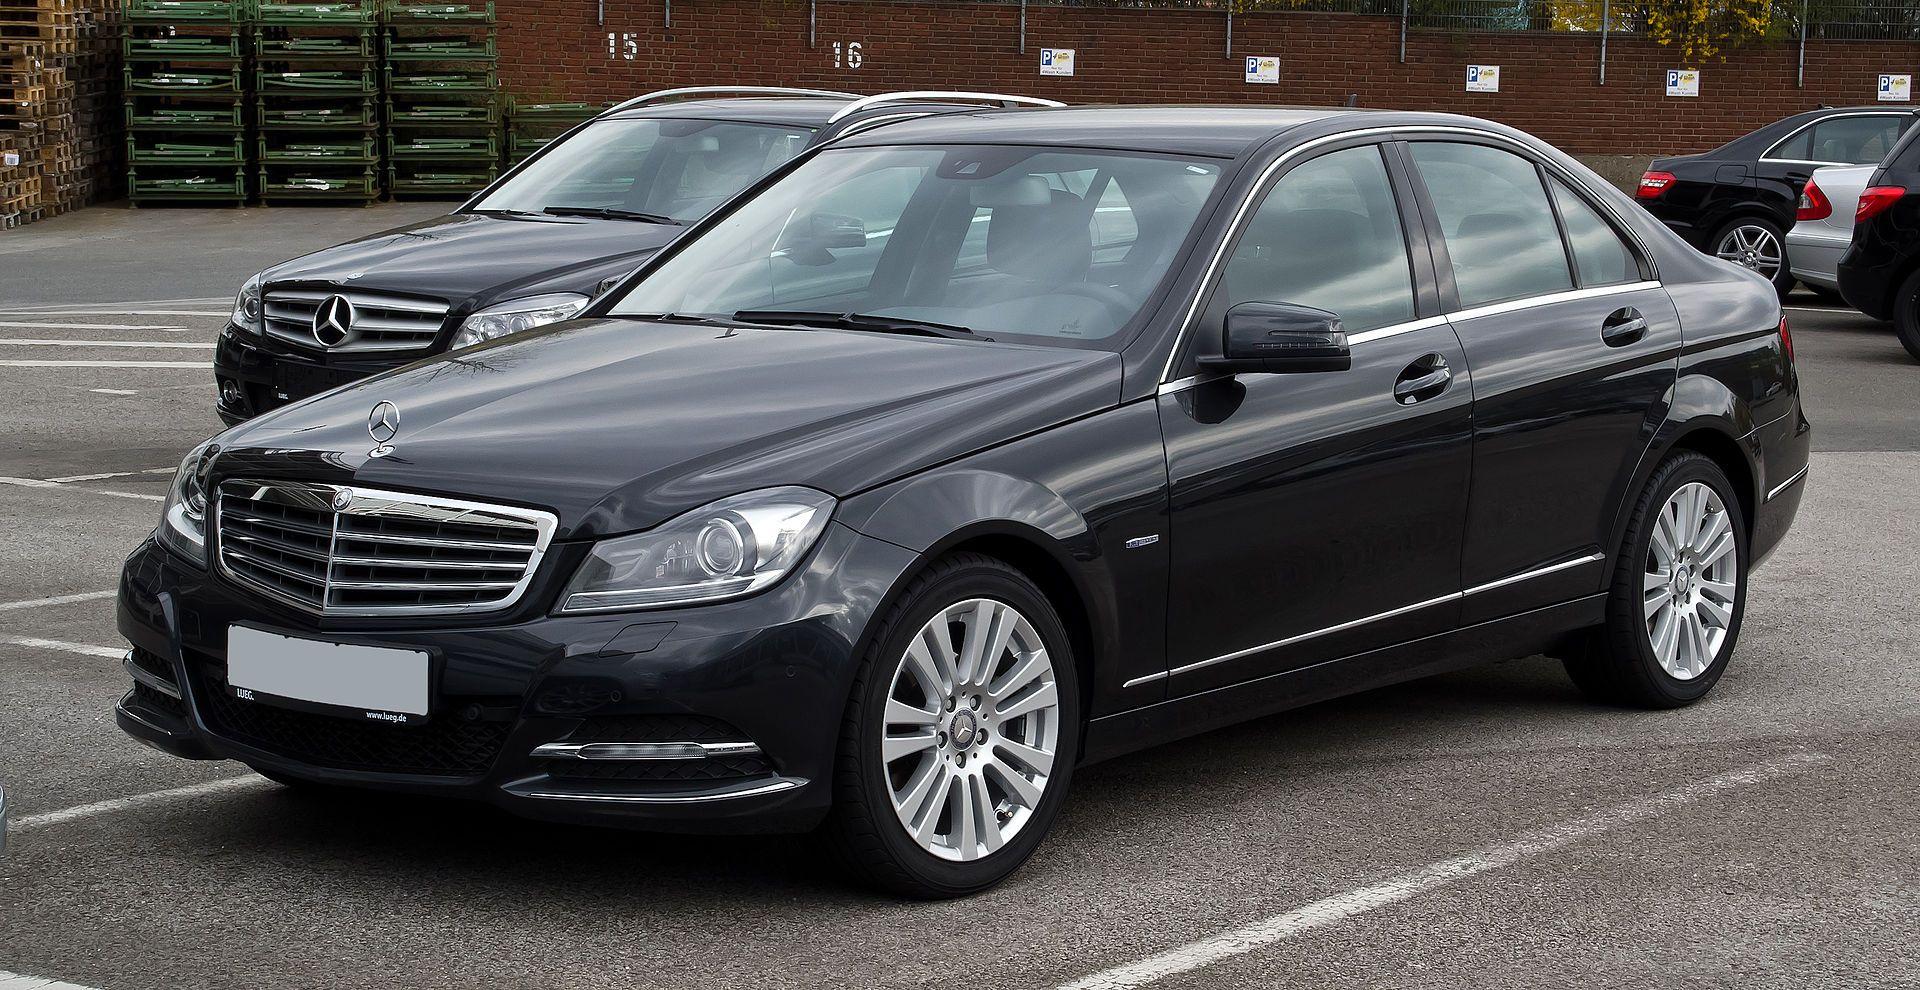 Mercedes Benz C 200 Cdi Blueefficiency Elegance W 204 Facelift